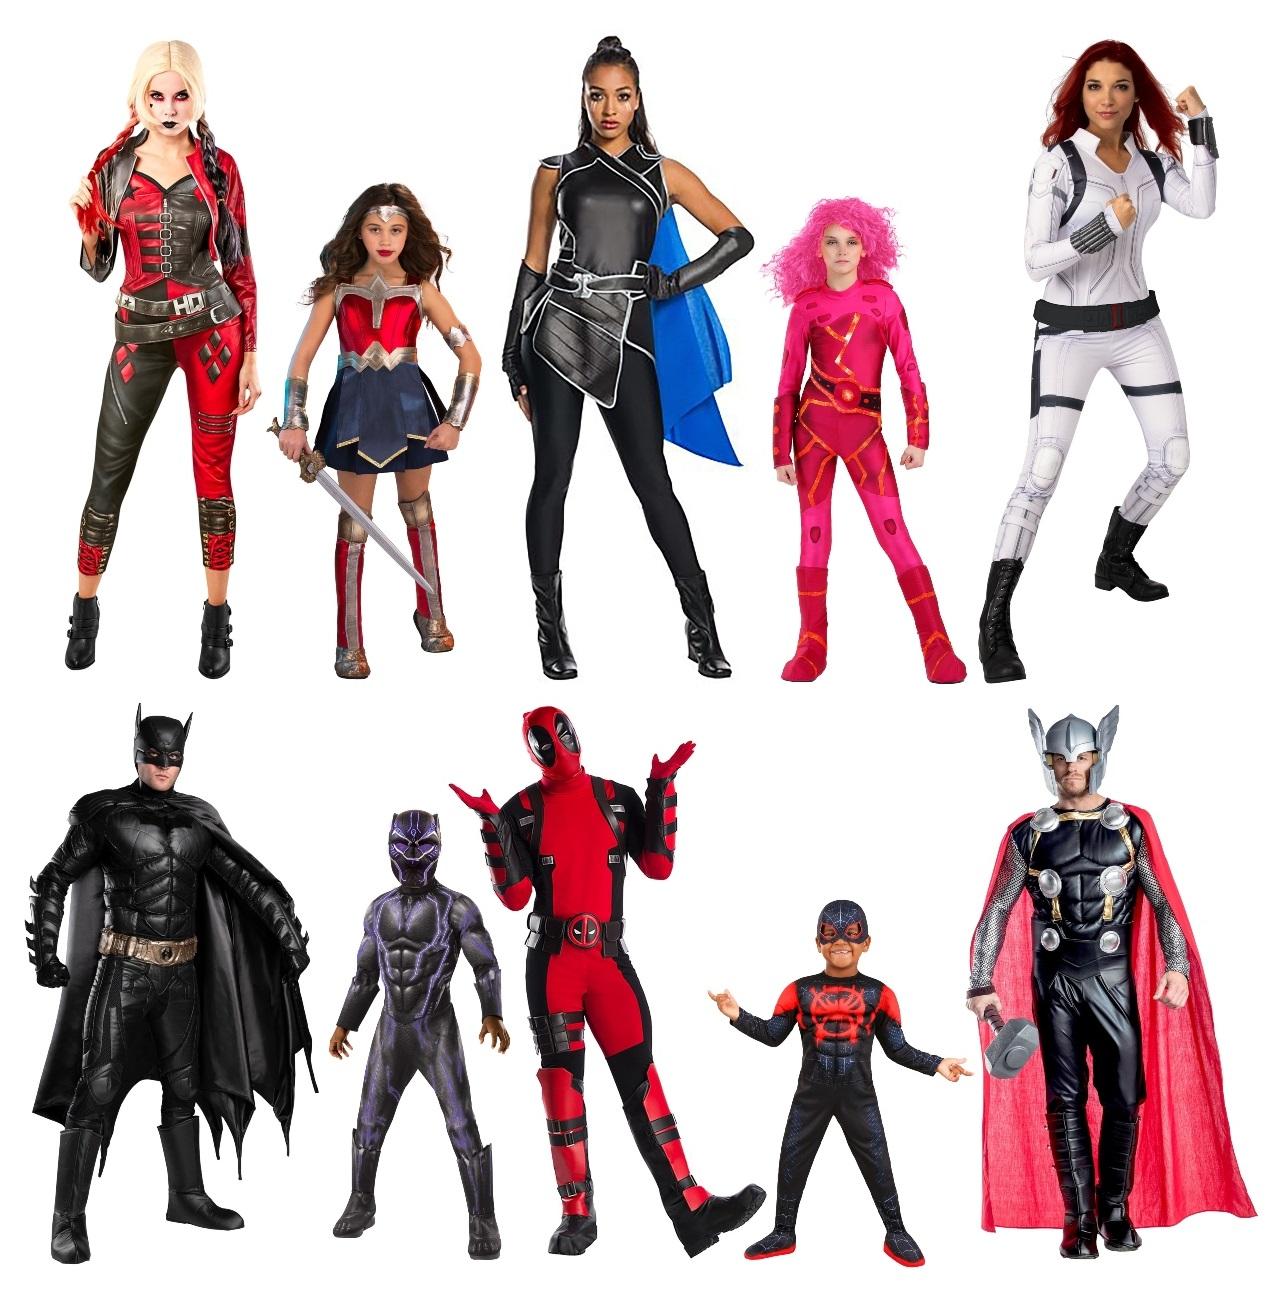 Superhero Group Costumes